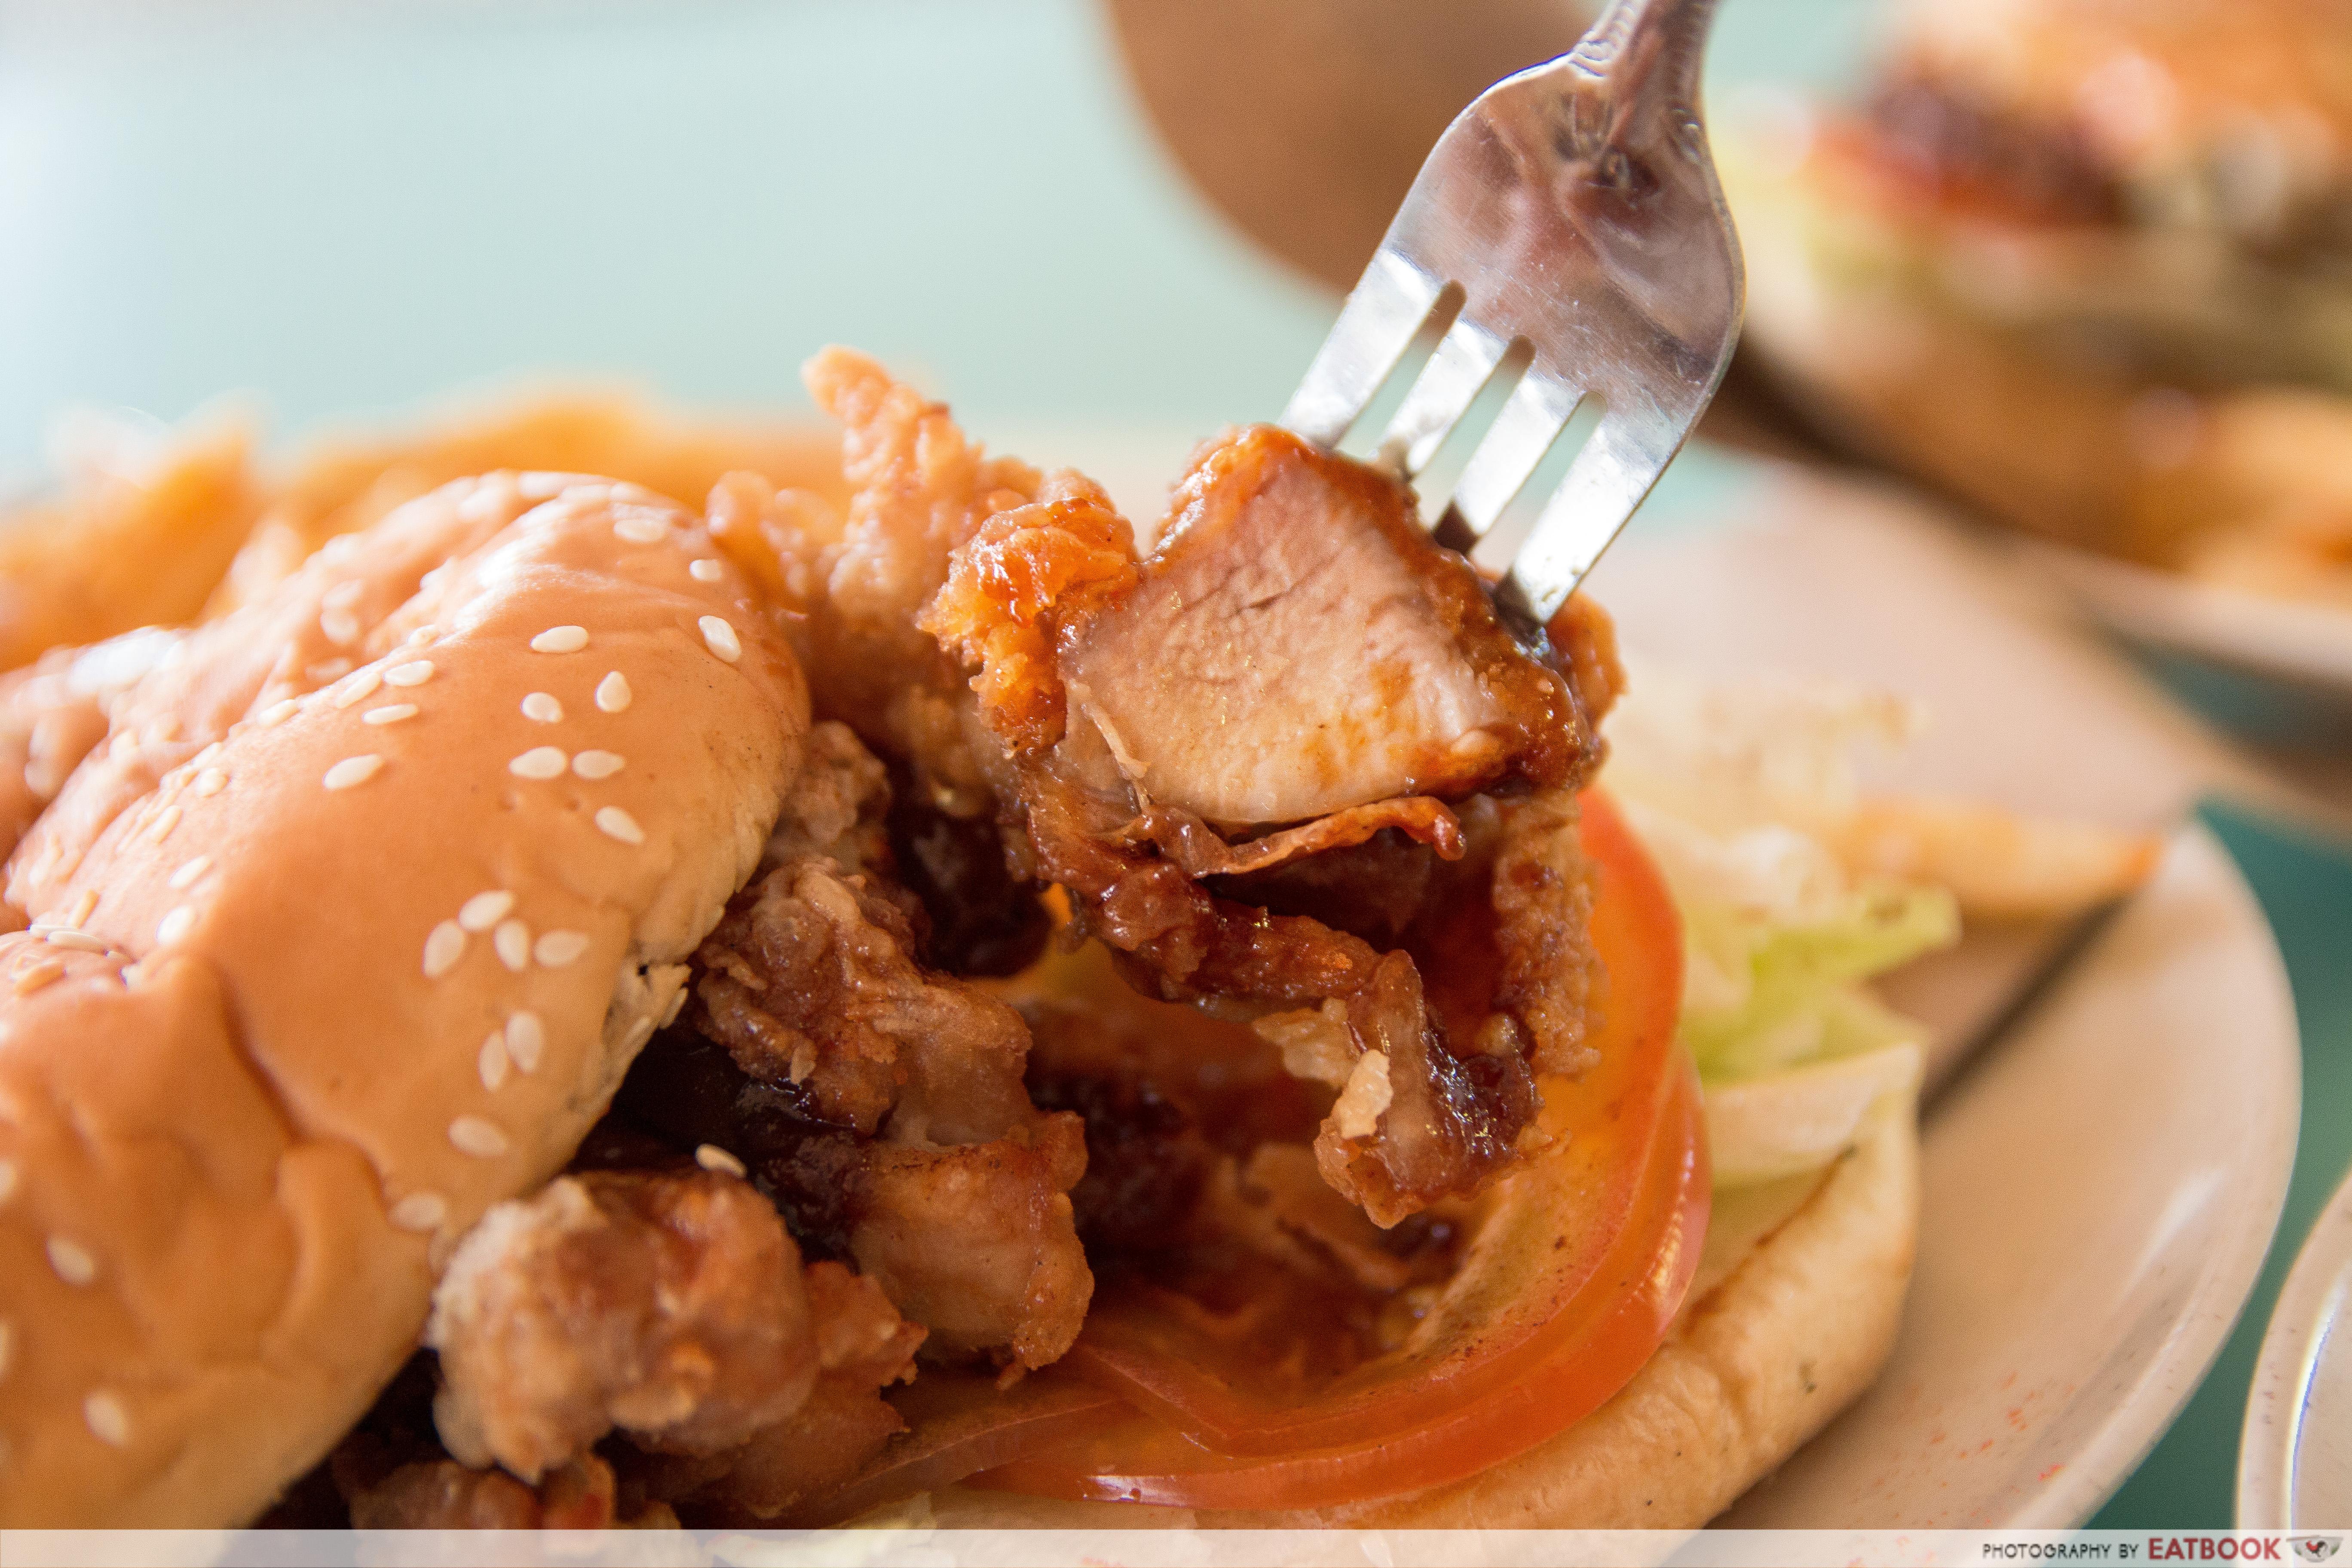 I Love Burger Lah! Har Cheong Gai Chicken